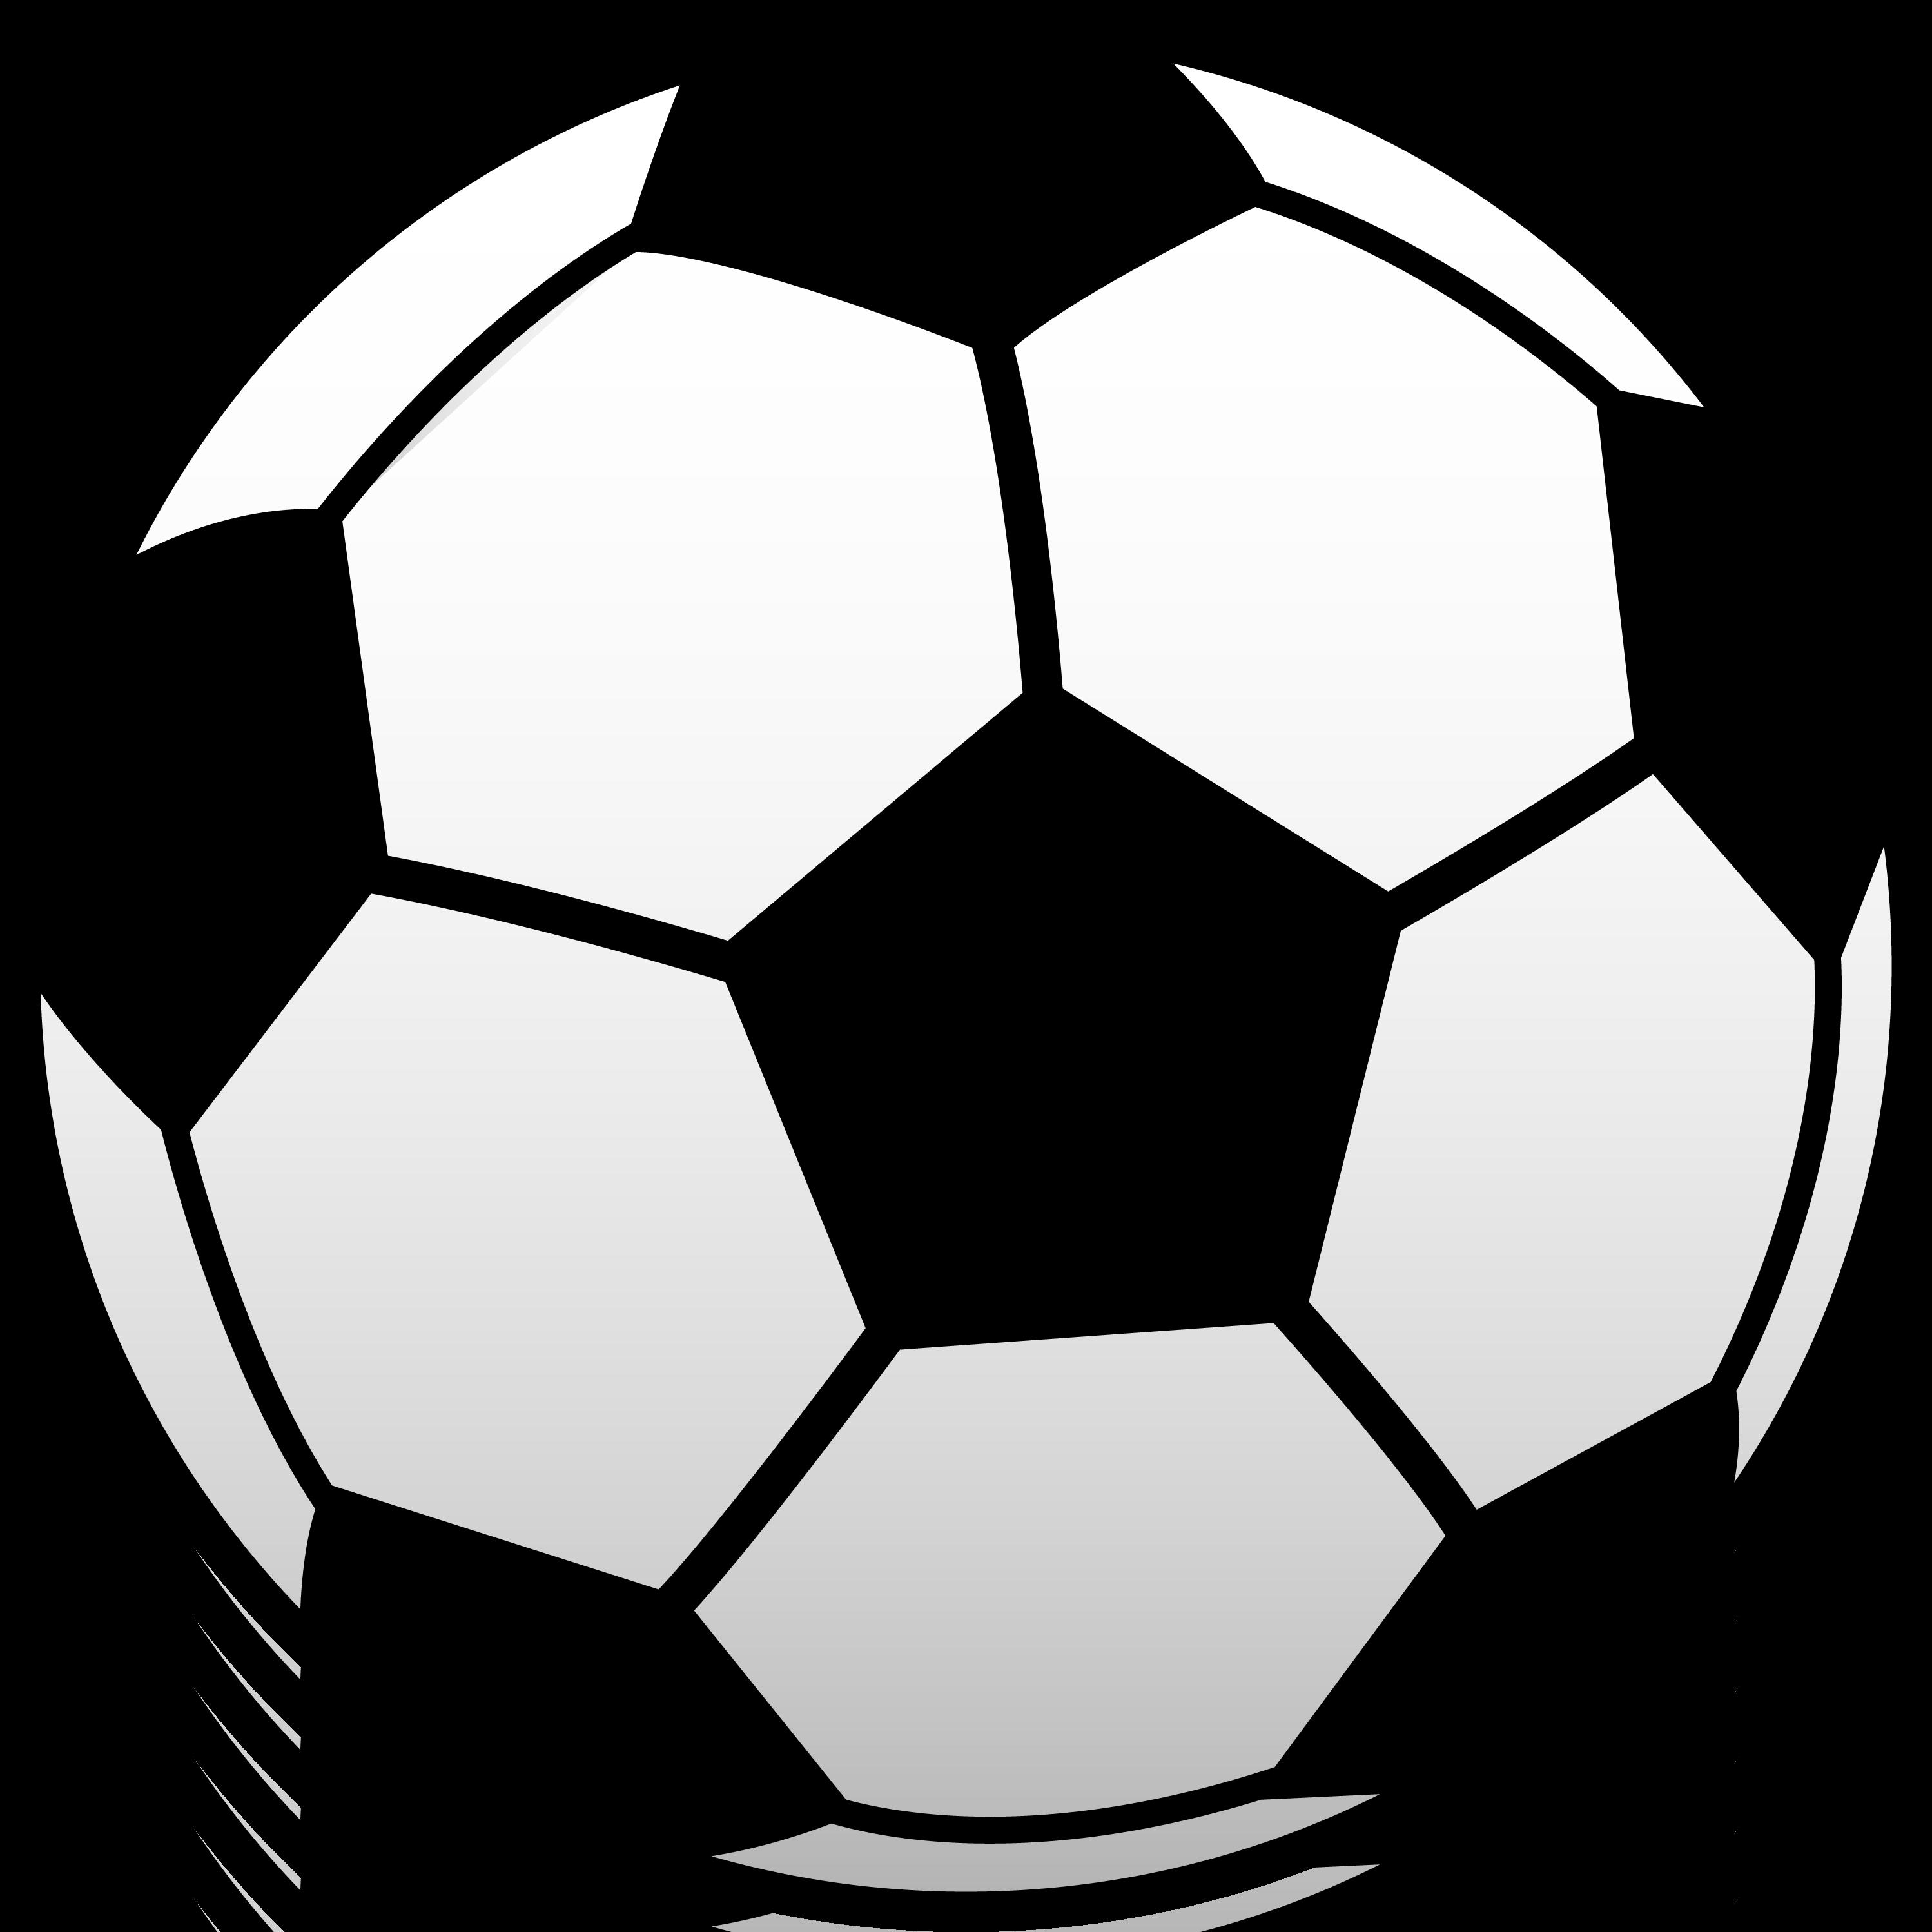 soccer ball clipart - Soccerball Clip Art